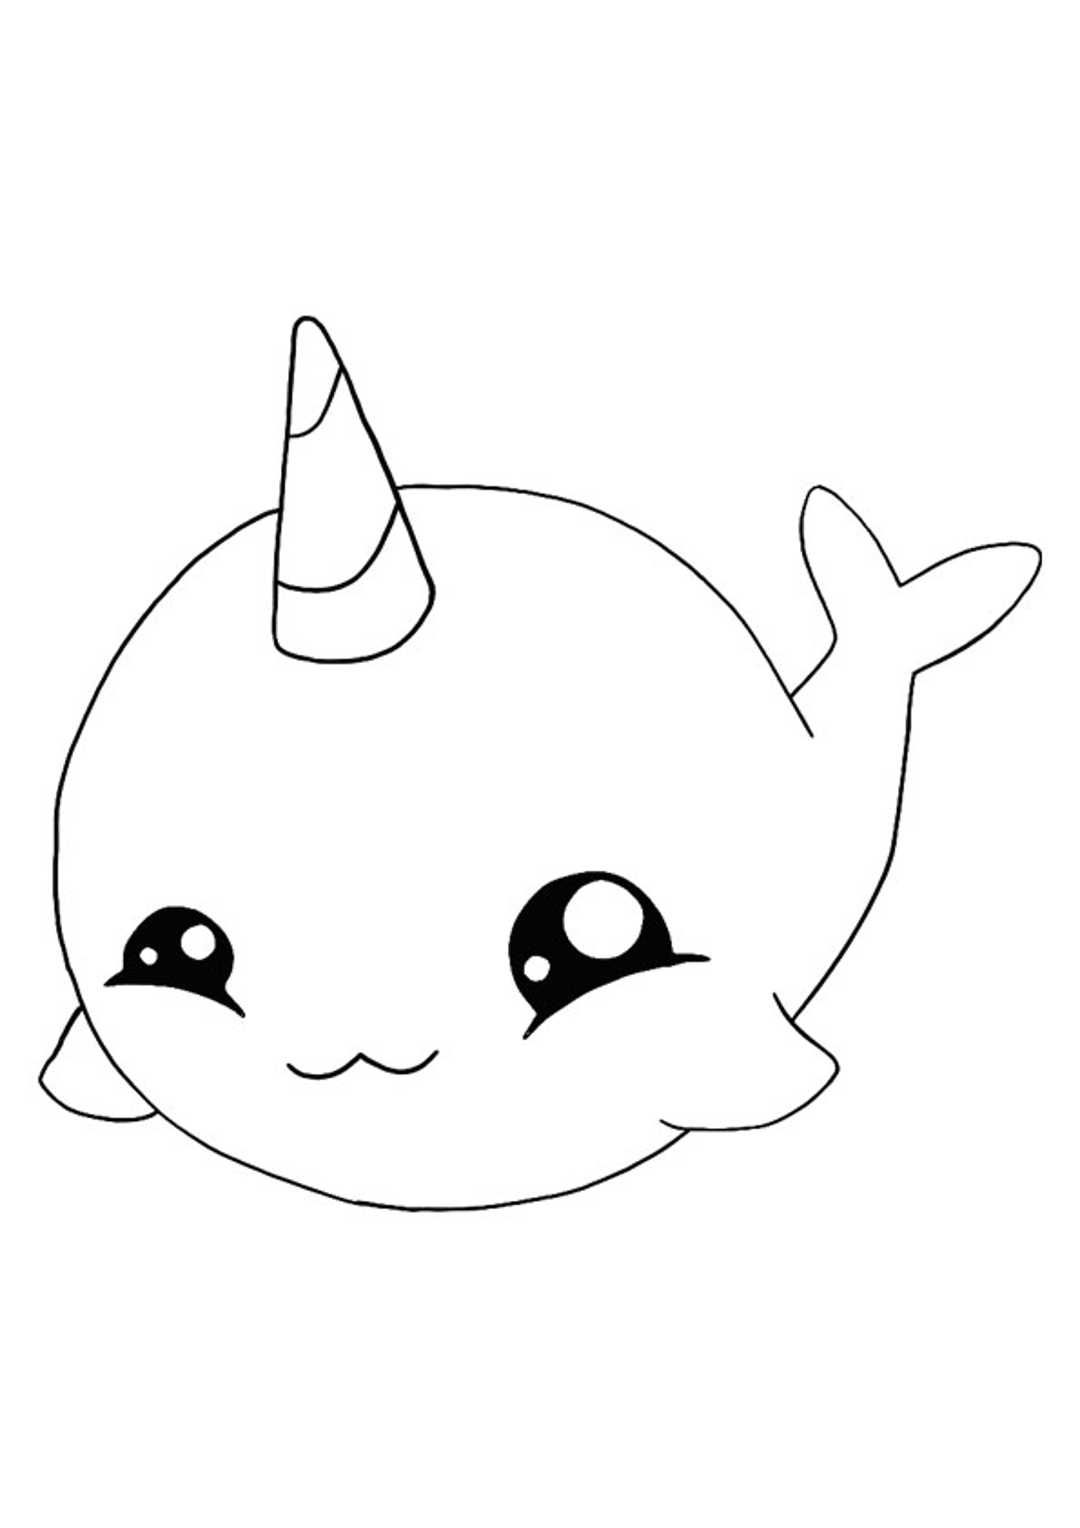 Unicorn Kawaii Coloring Pages : unicorn, kawaii, coloring, pages, Kawaii, Unicorn, Coloring, Pages,, Mermaid, Emoji, Pages